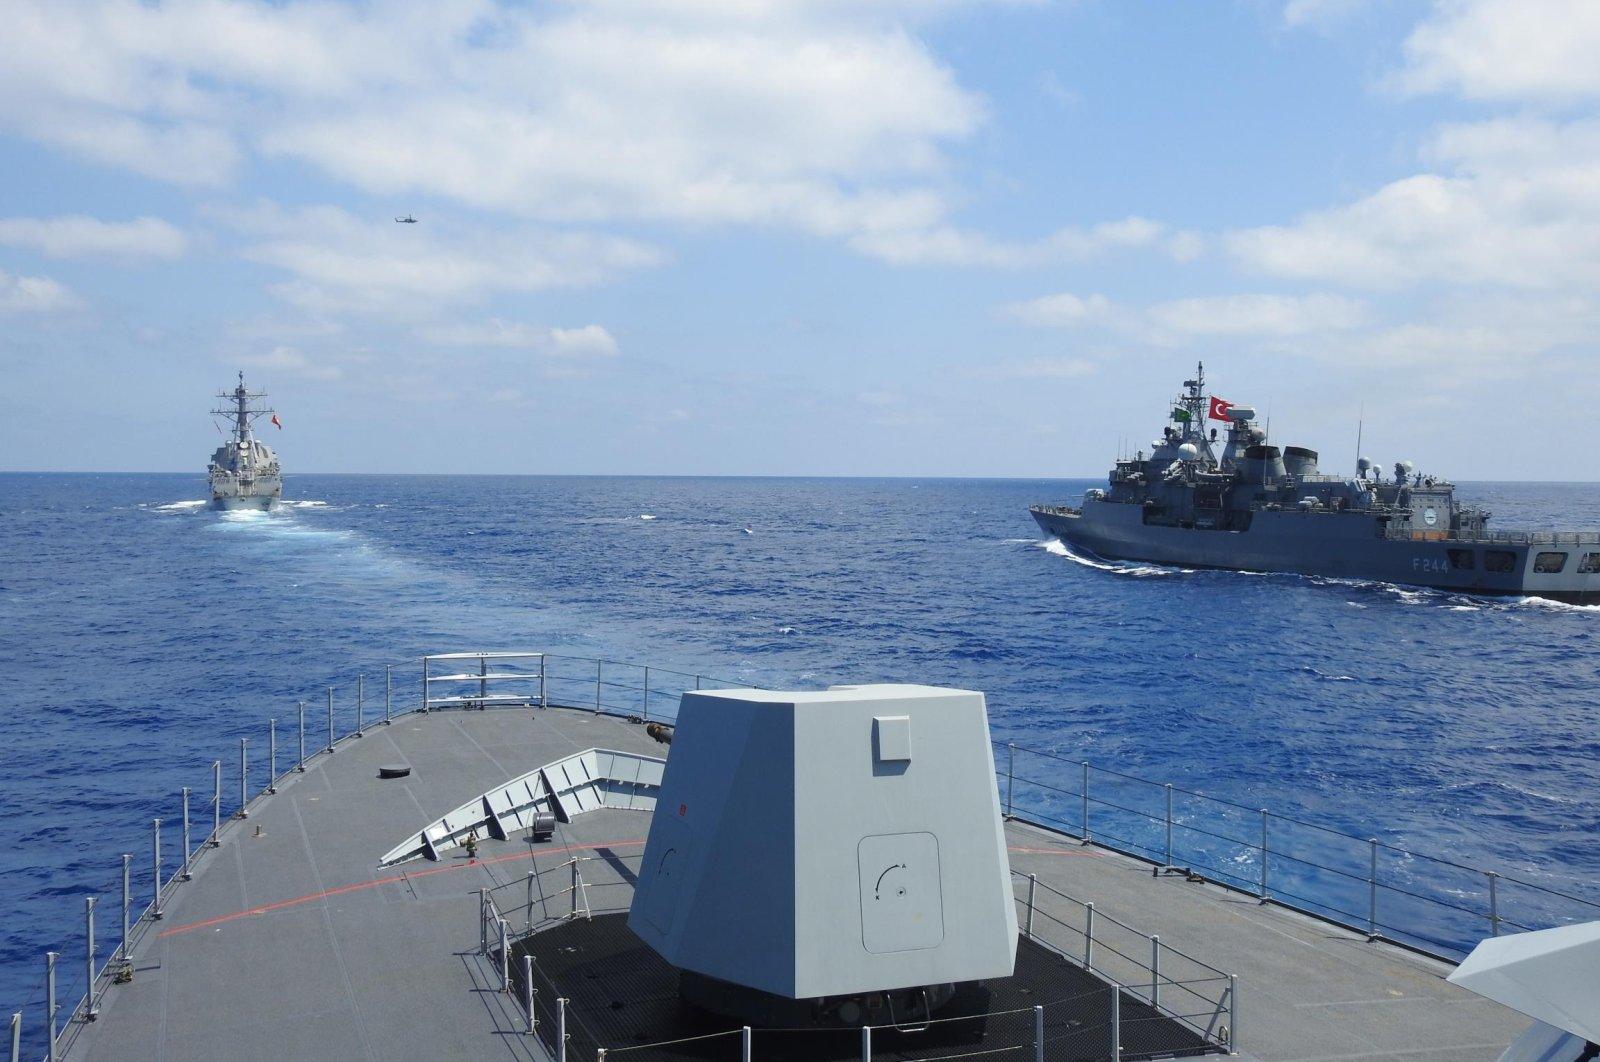 Turkey's TCG Barbaros frigate and TCG Burgazada corvette sail during a drill in Eastern Mediterranean on Aug. 26, 2020 (AA Photo)